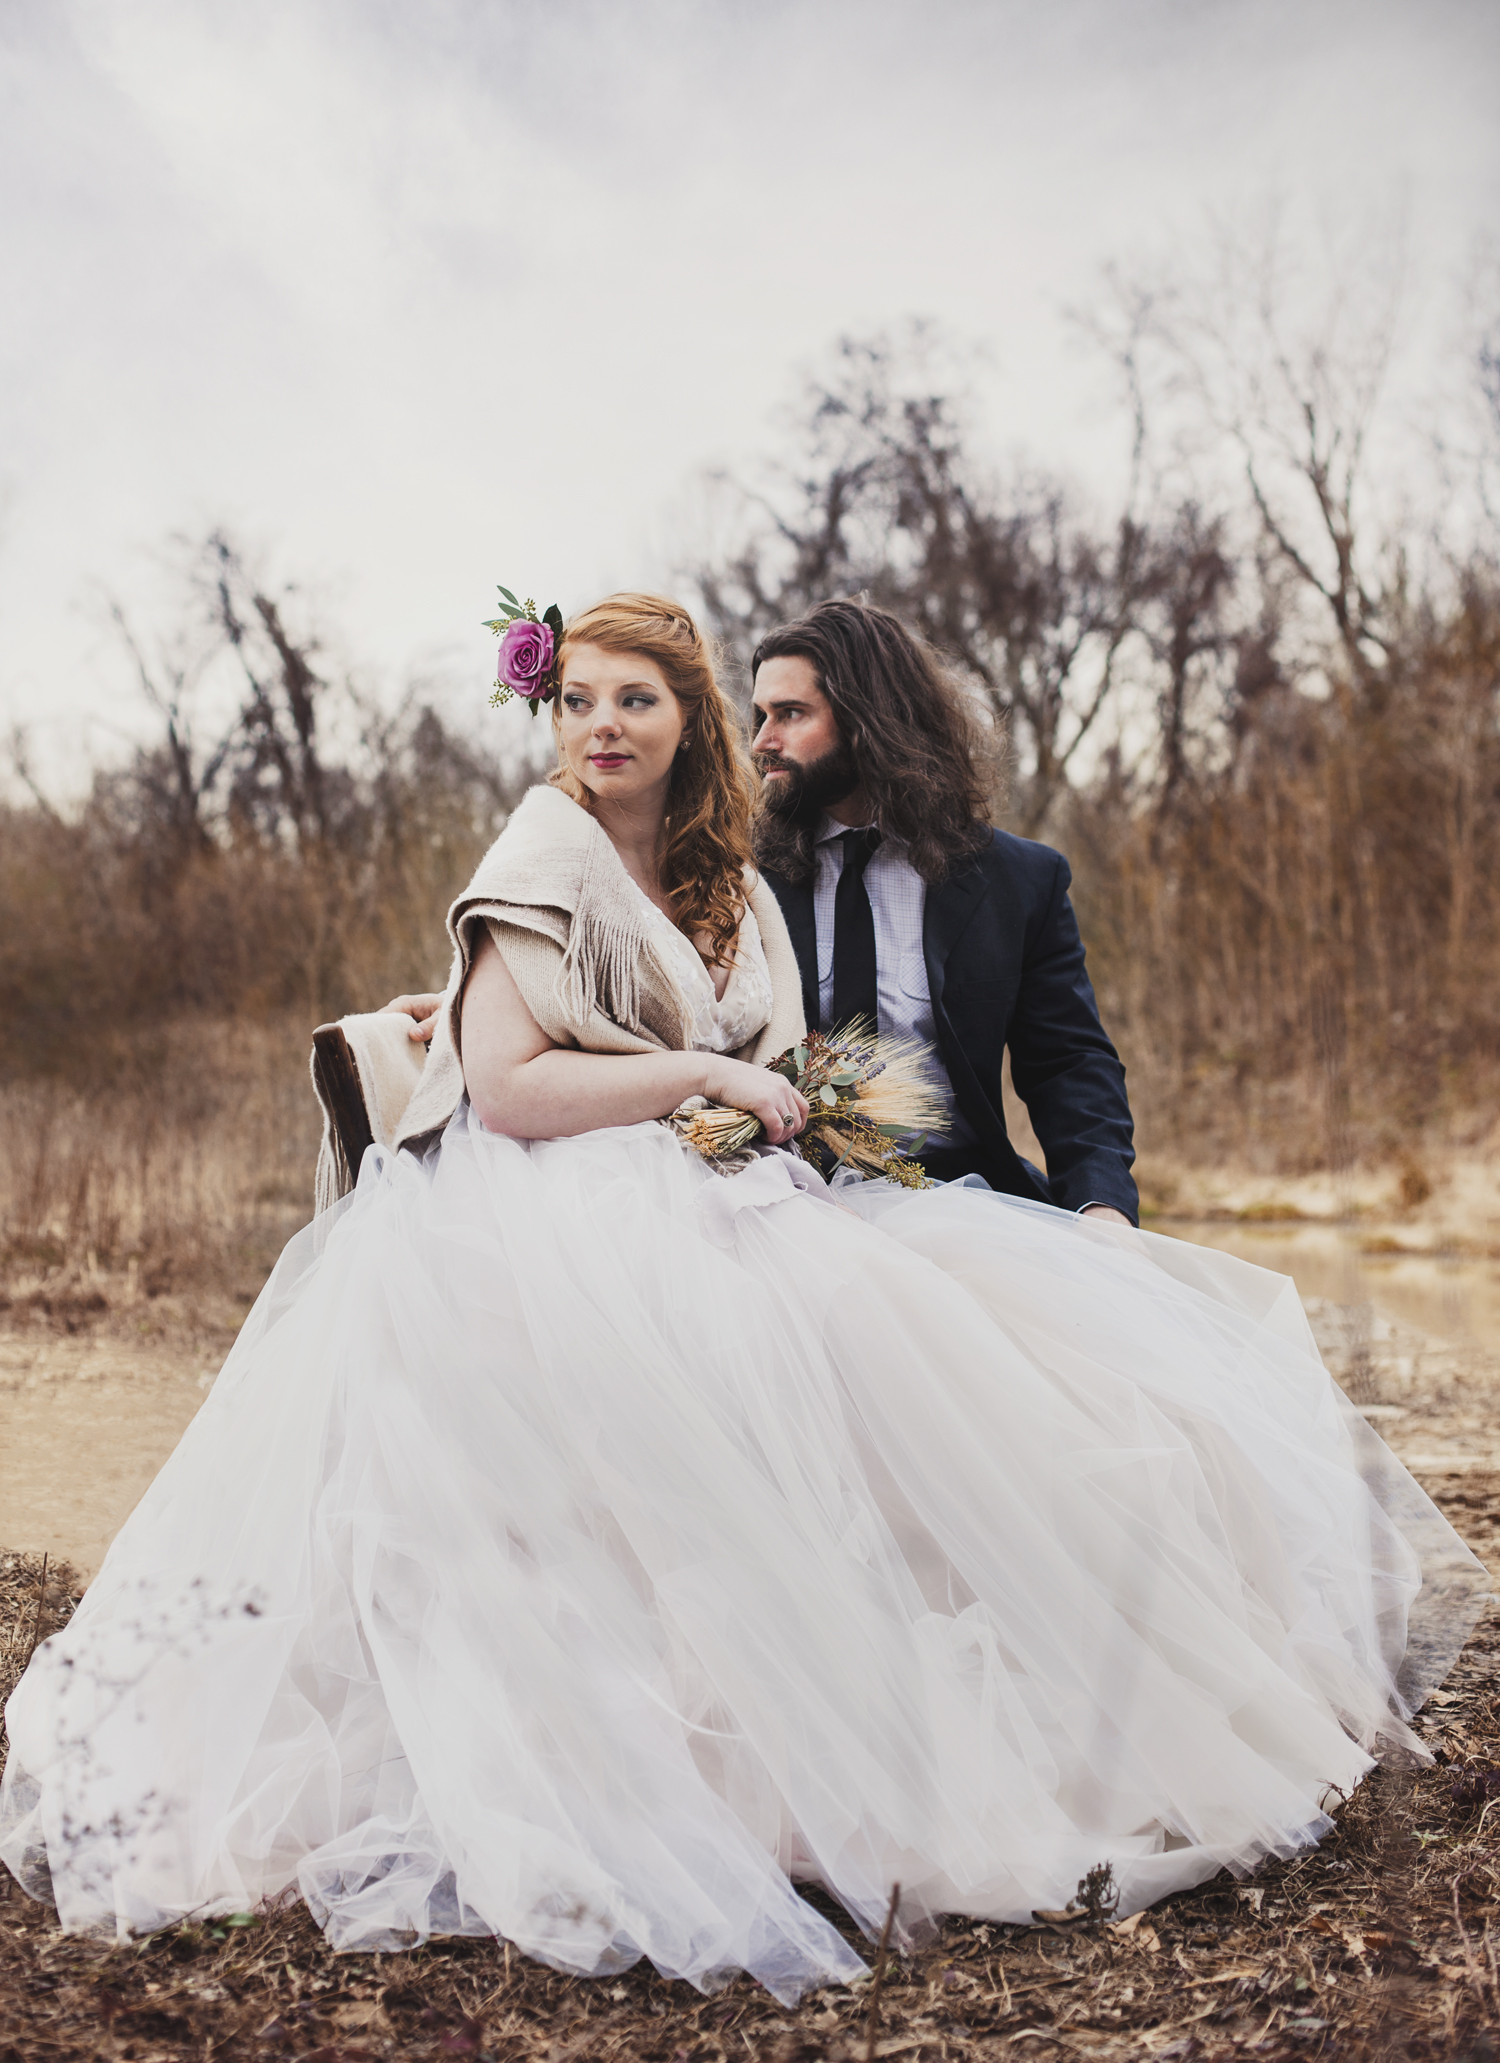 Sara + Matt + Ella _Give Back Bride_Styled Wedding Shoot _K. Stoddard Photography019.jpg